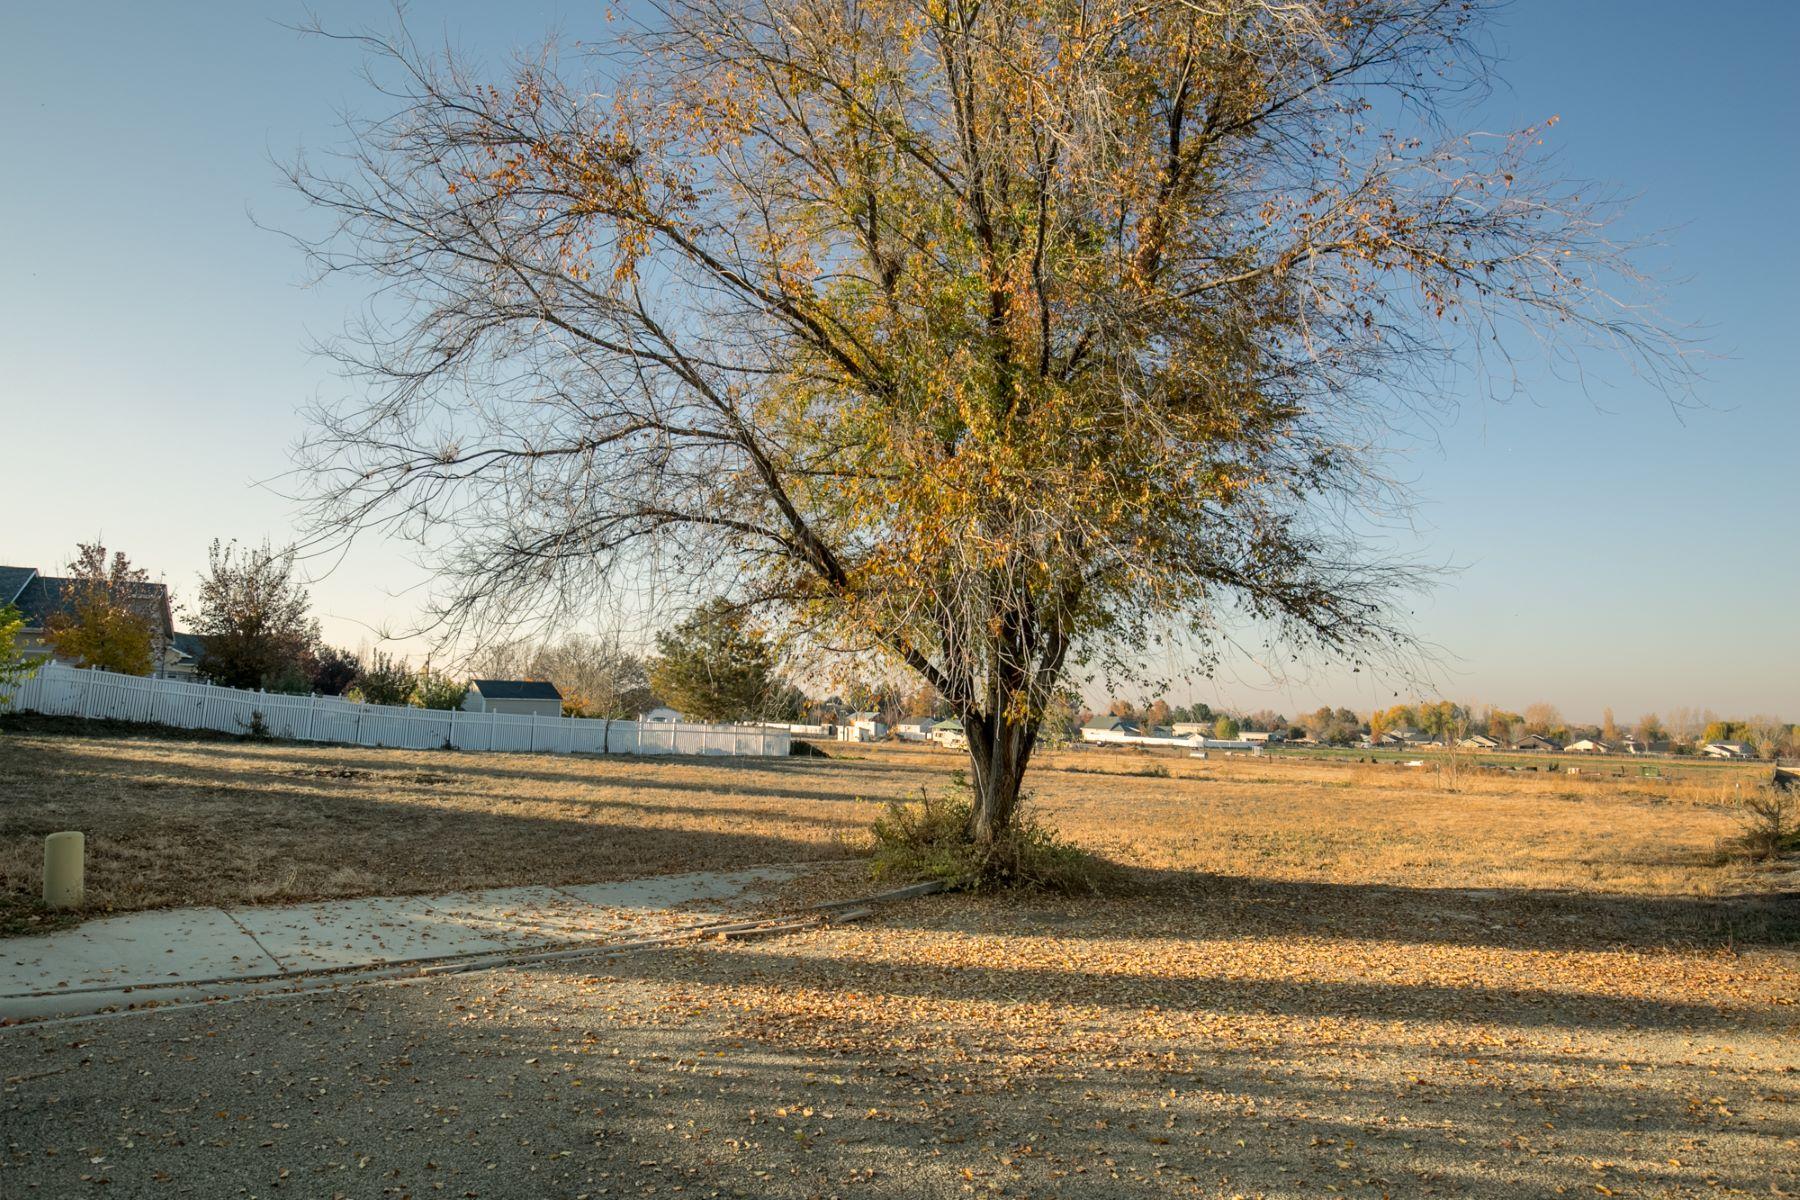 Terreno por un Venta en TBD Marshall Avenue, Caldwell Caldwell, Idaho, 83605 Estados Unidos